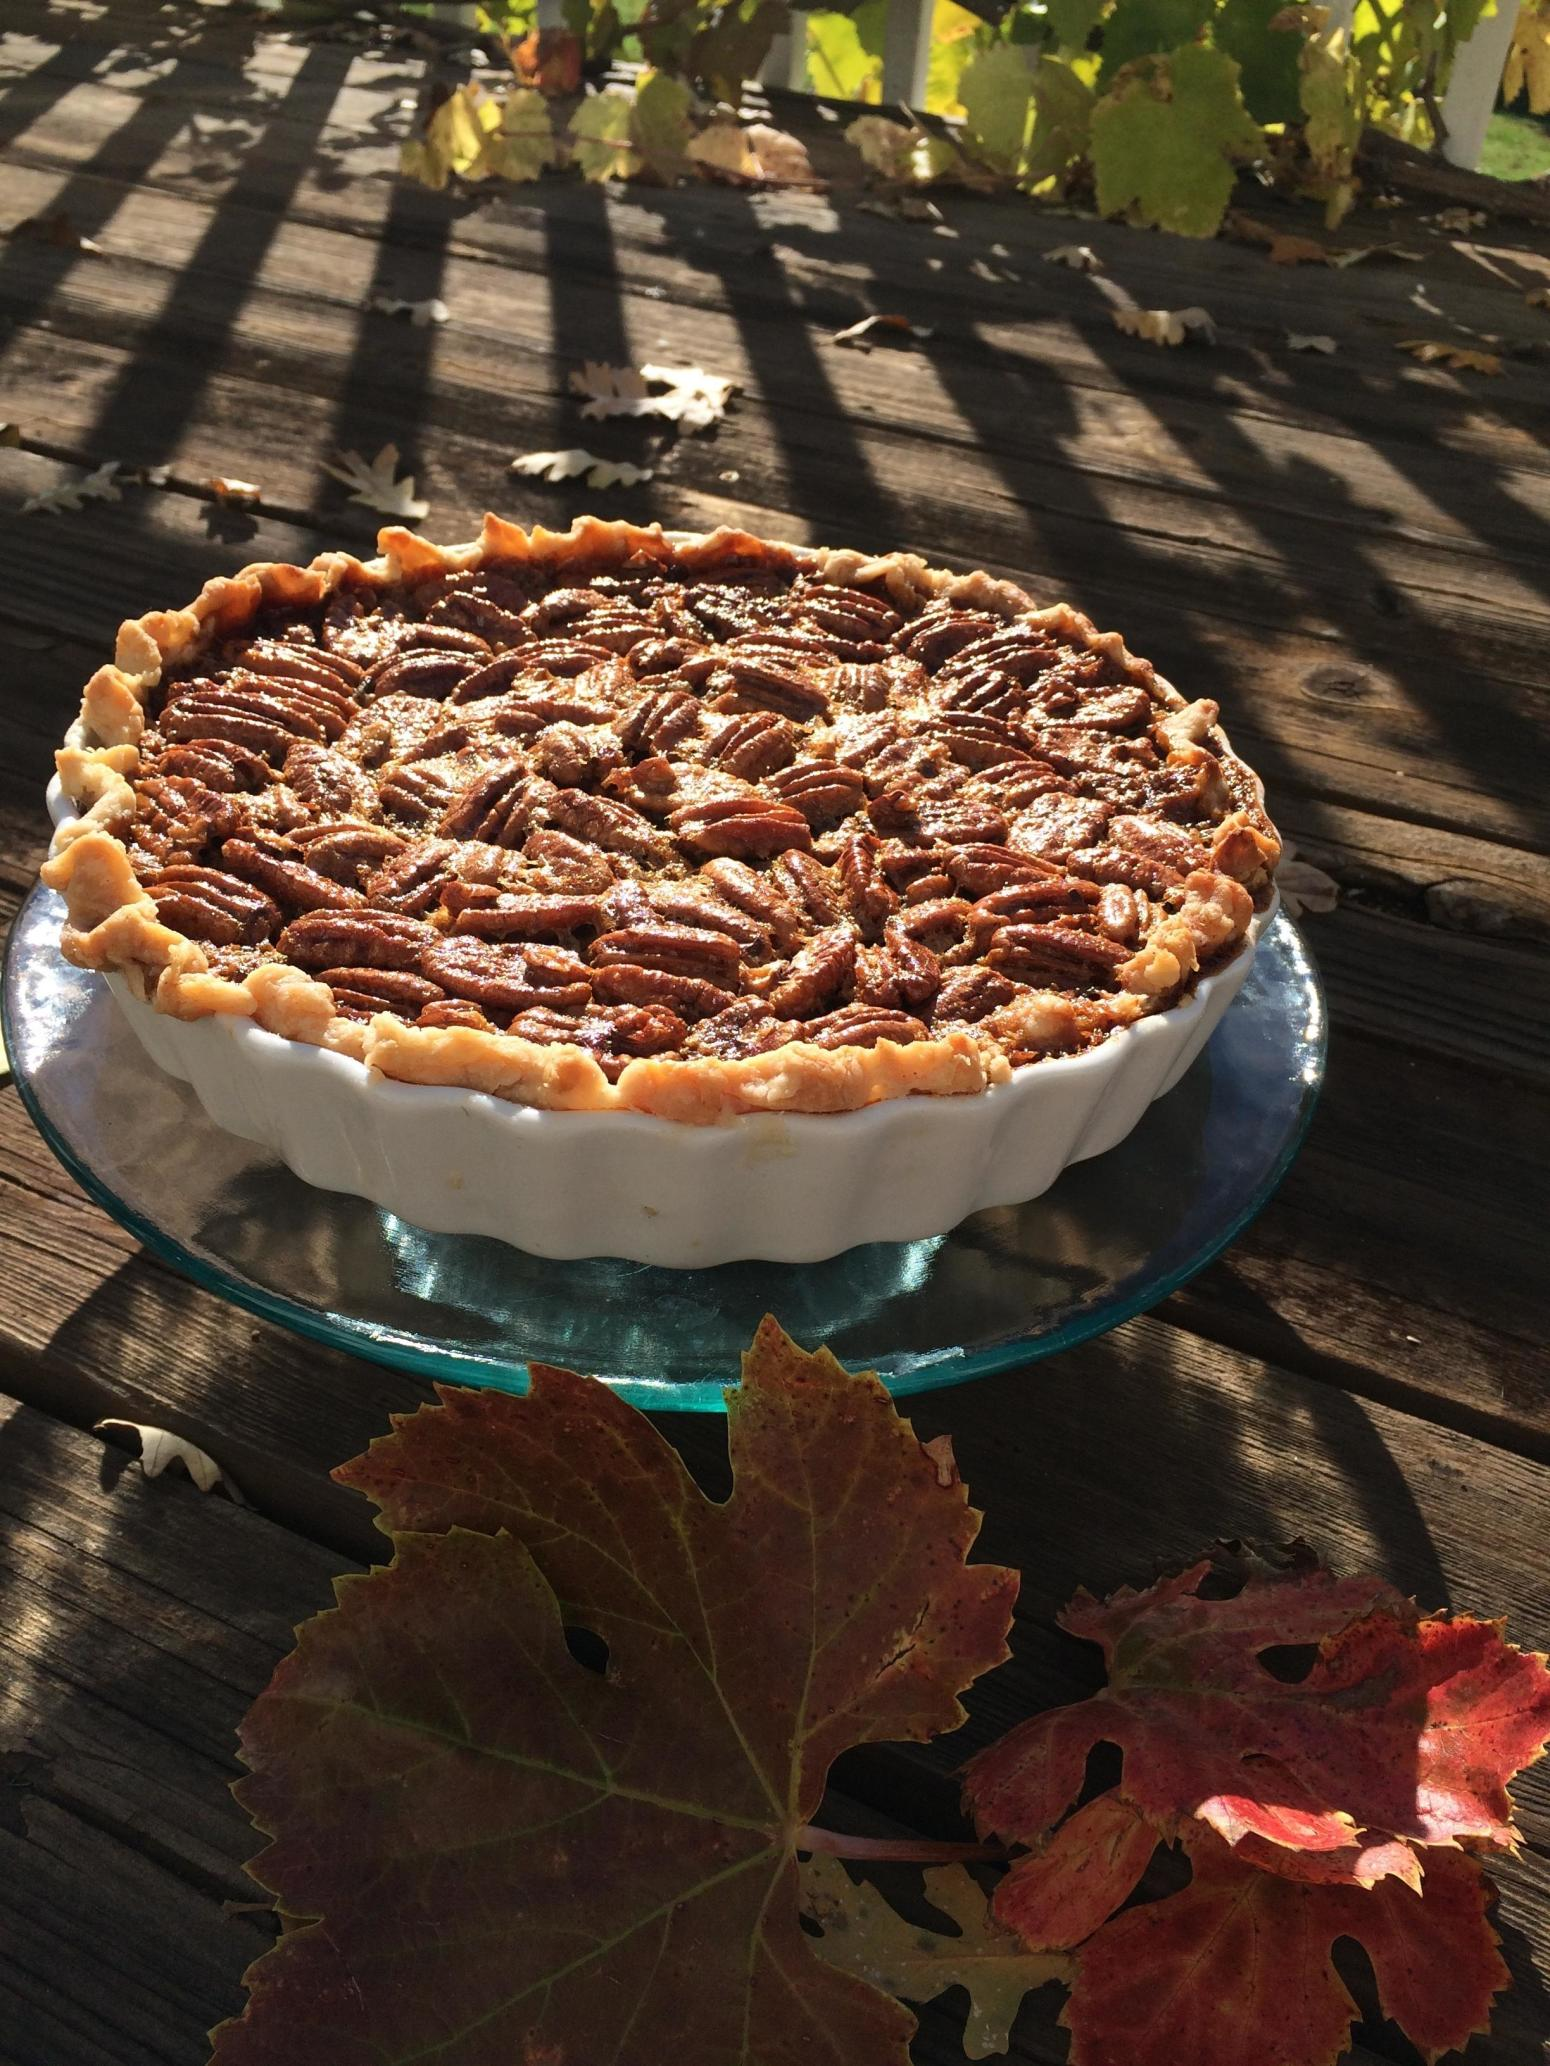 Grandma Gray's Famous Chocolate Pecan Pie (recipe for 2 pies)